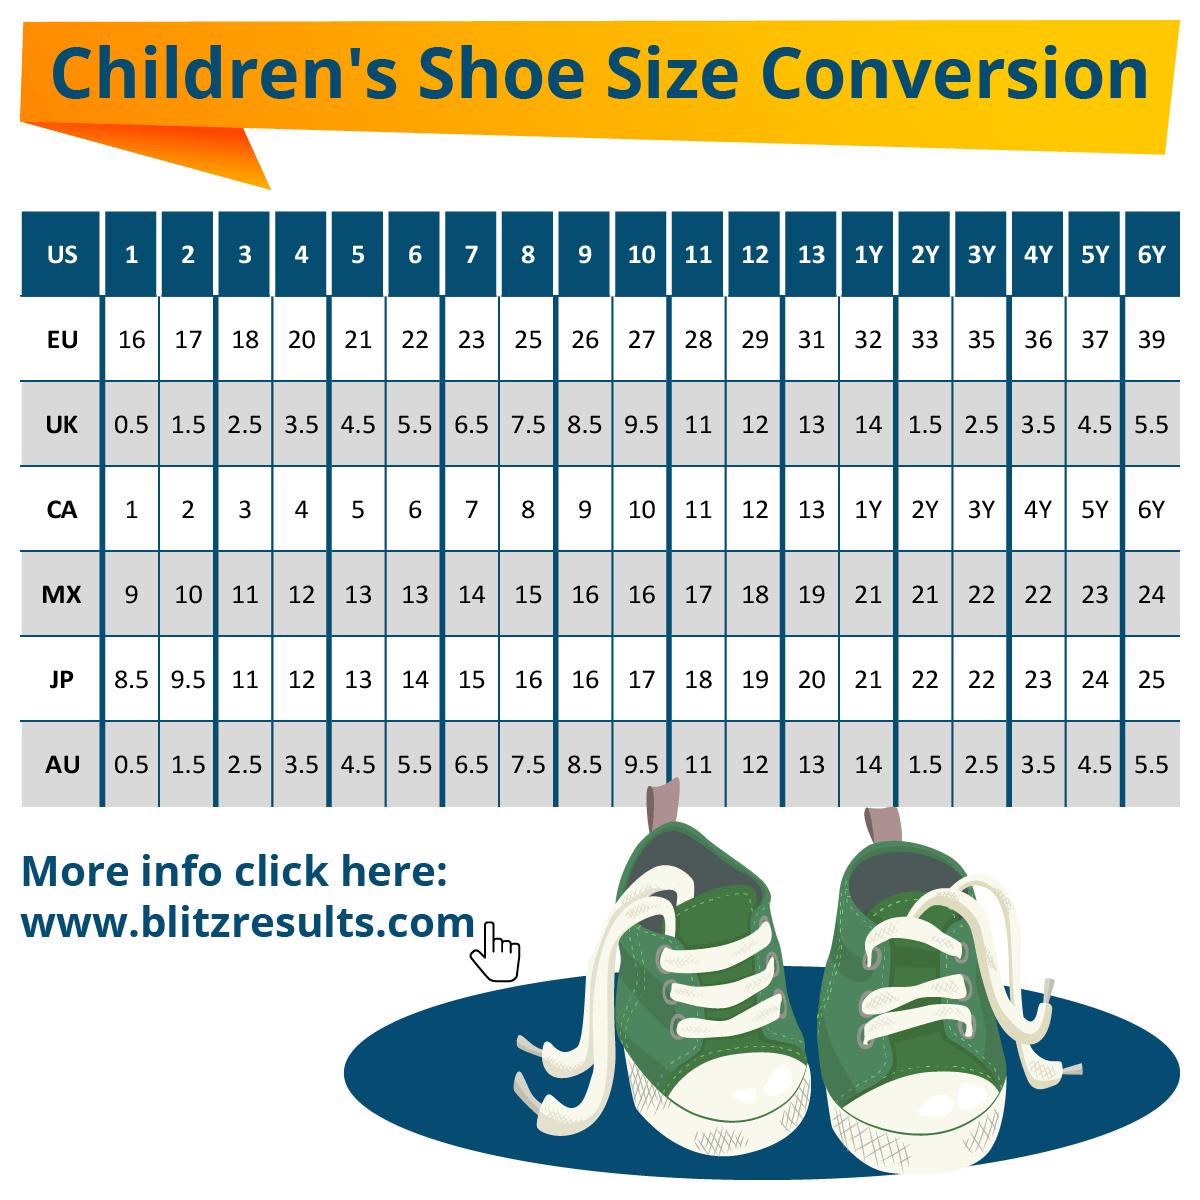 ᐅ Kids Shoe Size Conversion: UK to US. EU to US + International Charts